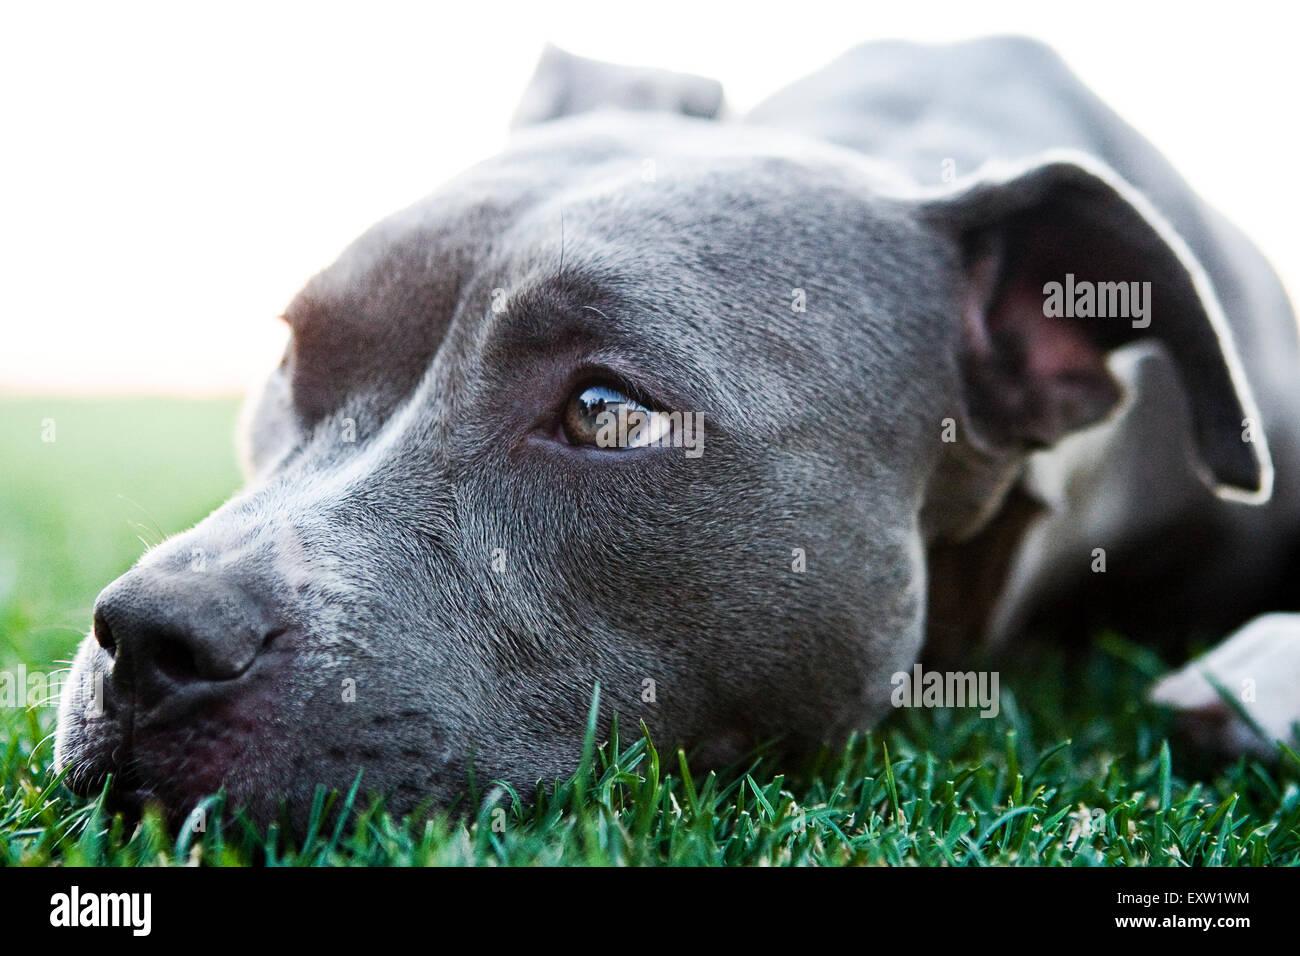 Cierre vertical azul hermoso pitbull sentar cabeza en hierba Imagen De Stock